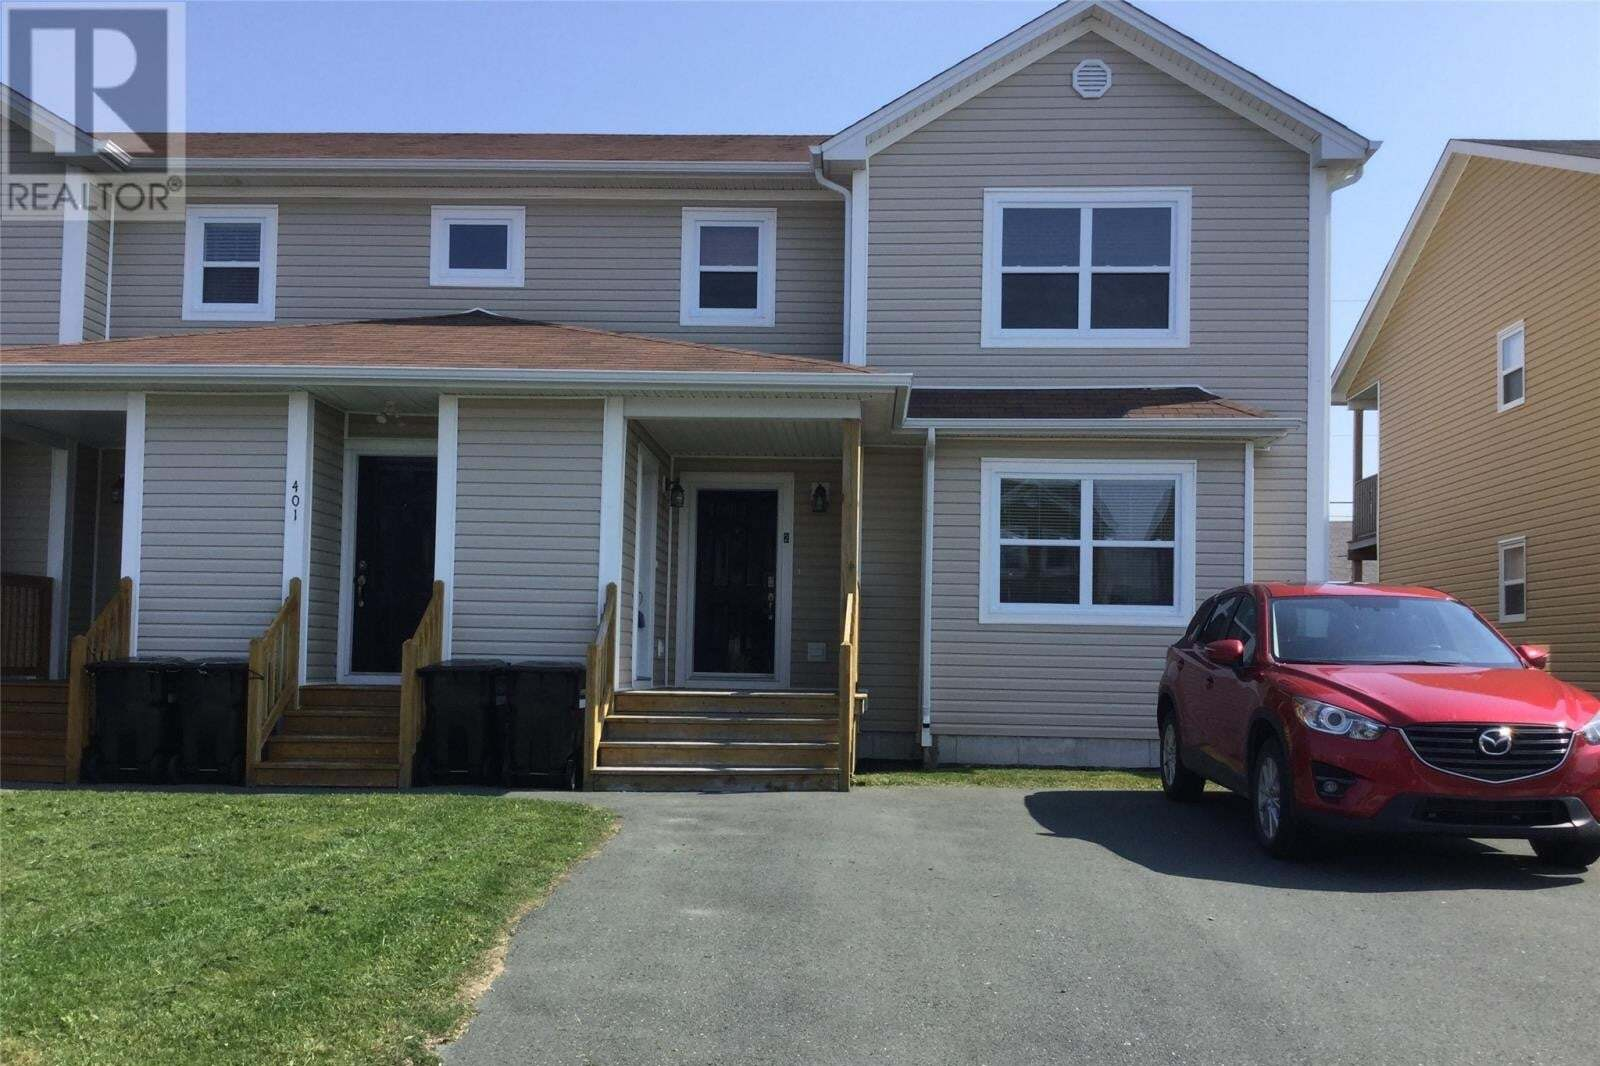 House for sale at 401 Blackmarsh Rd St John's Newfoundland - MLS: 1221064